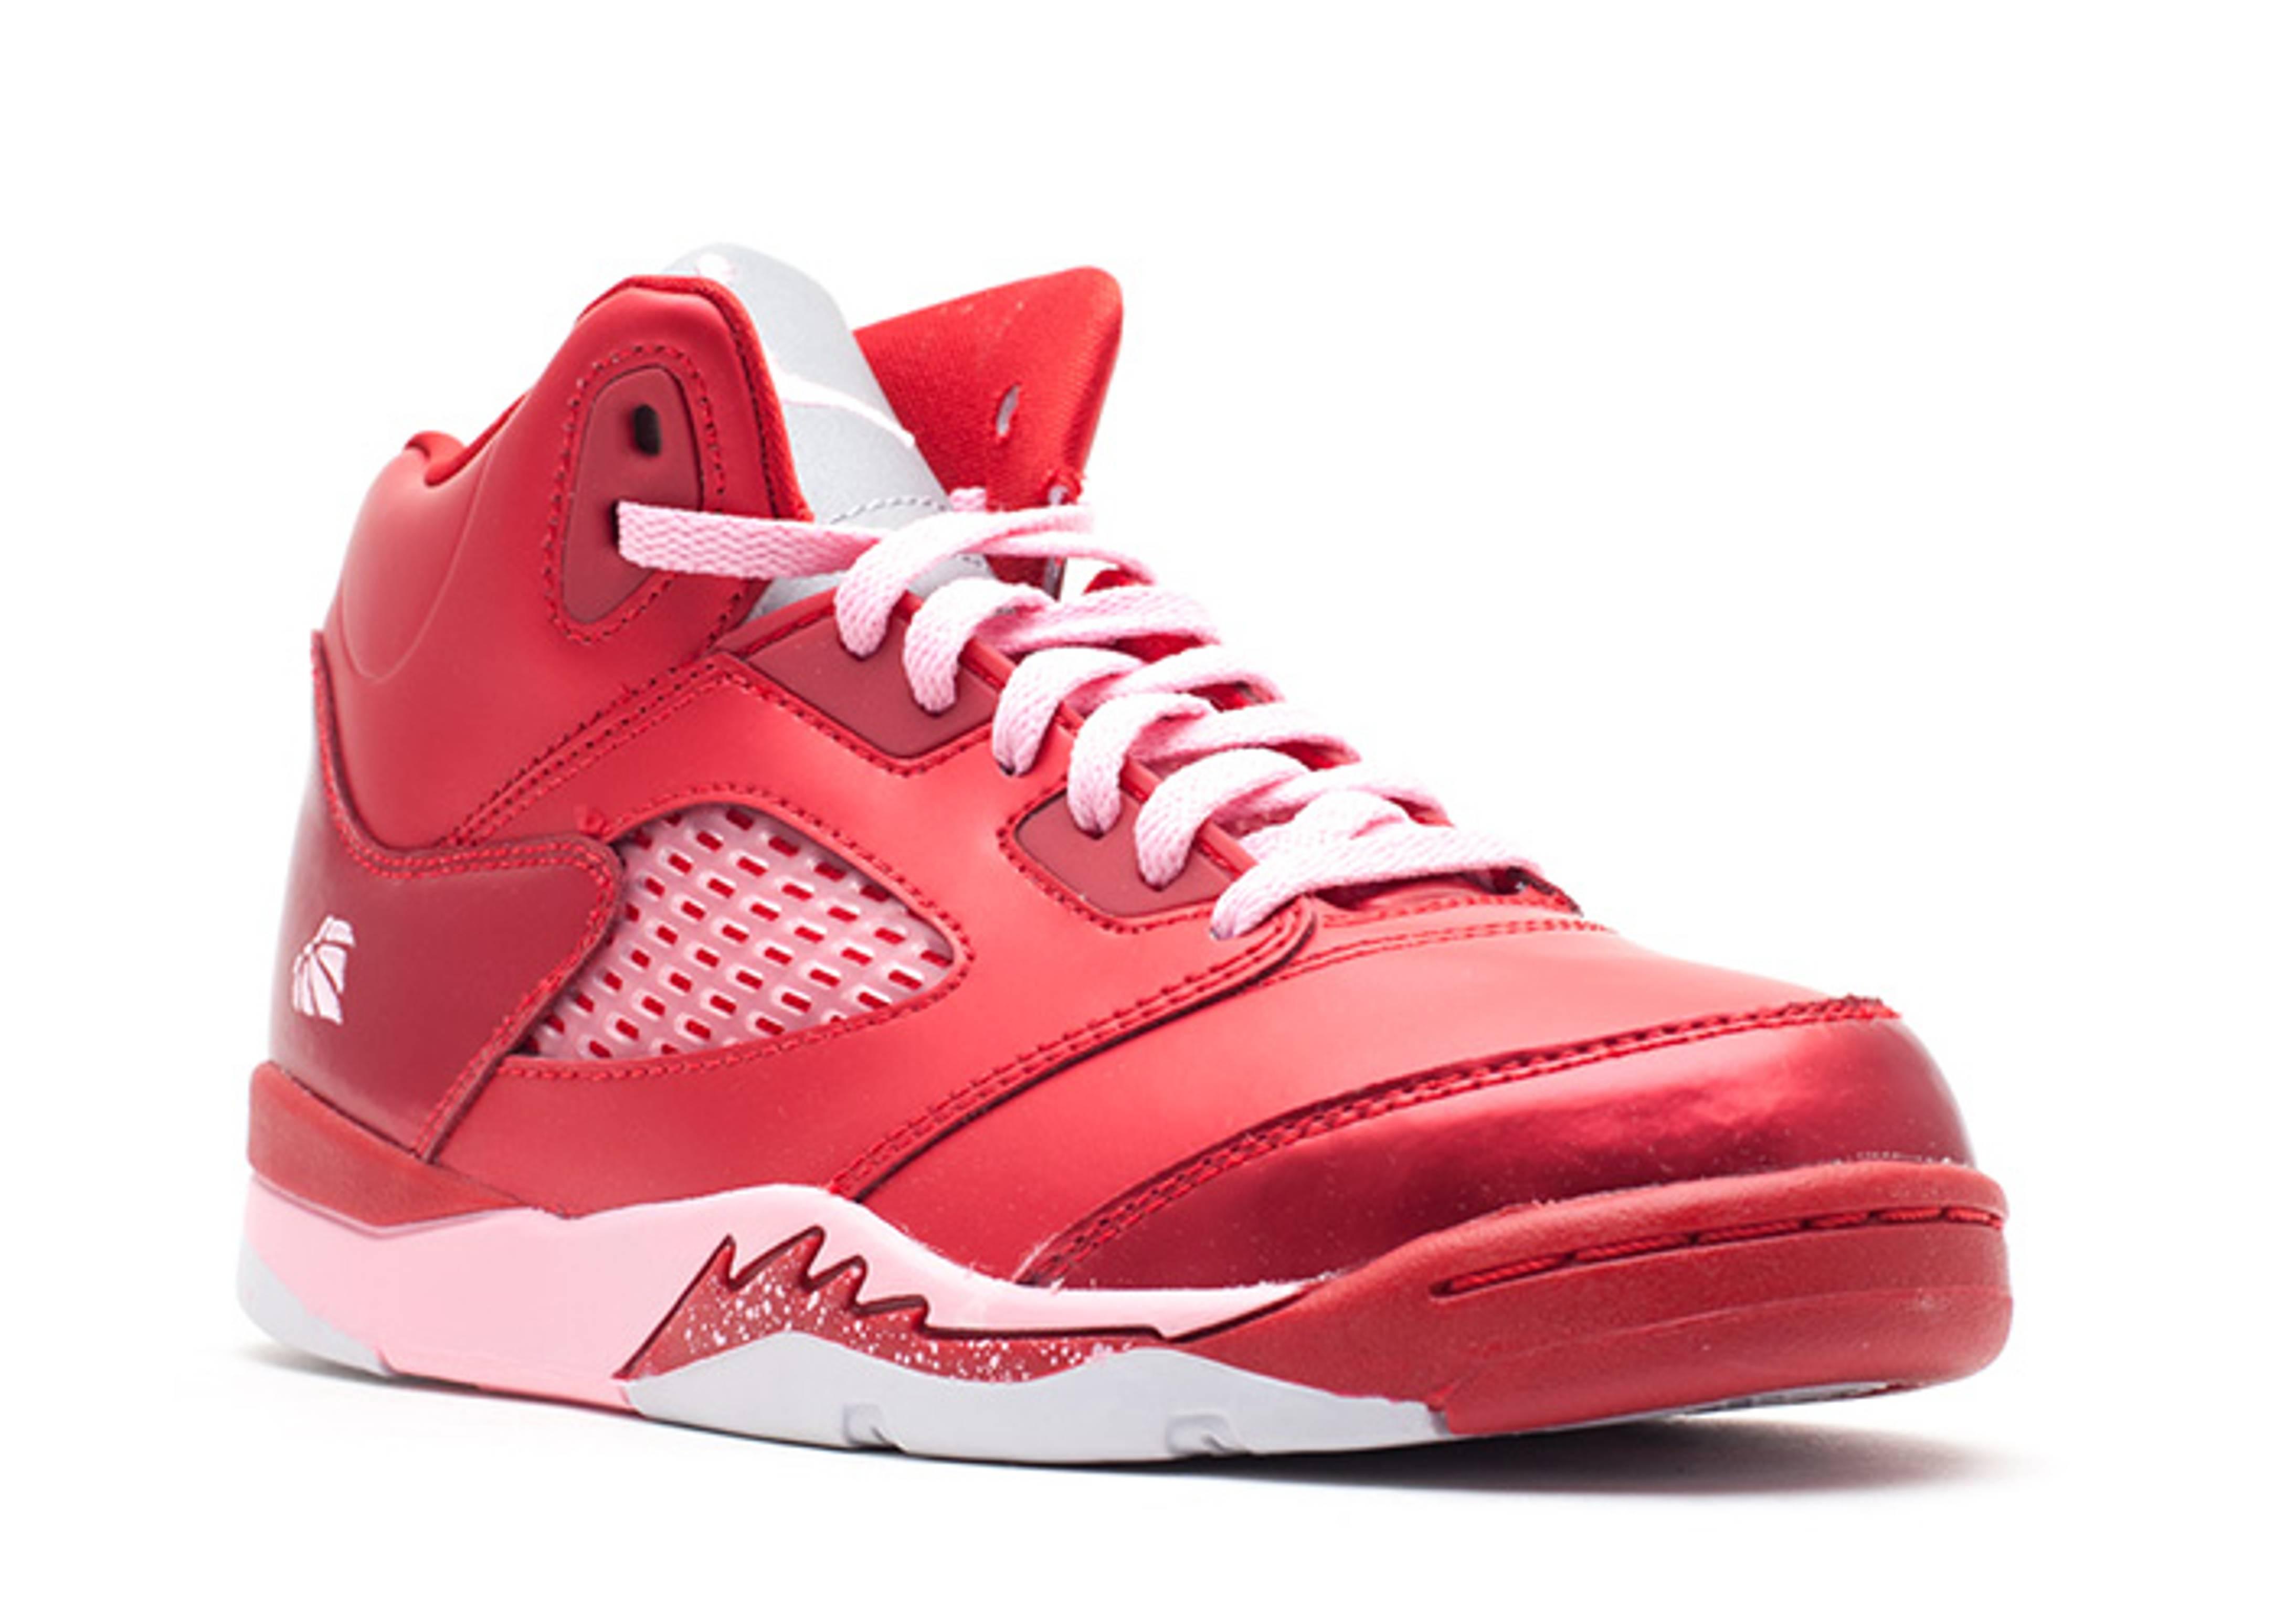 69ffbcaeeaa7f5 discount code for jordan 11 valentine red 06563 a5d9d